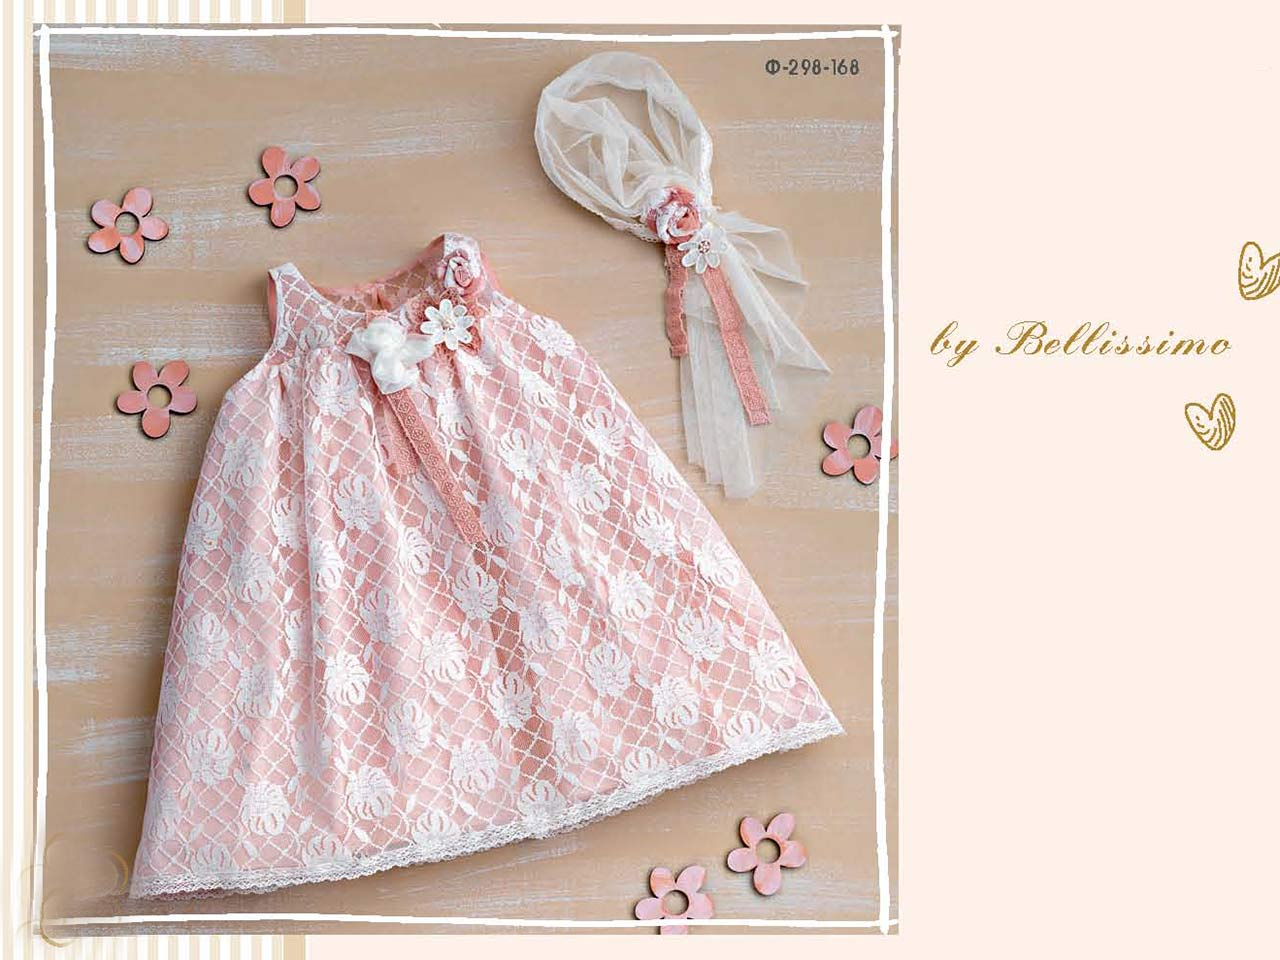 fdac0274bdf ... Ρούχα / Βαπτιστικό Φόρεμα Λευκή Δαντέλα και Σάπιο Μήλο. 🔍.  vaptistiko-forema-f298-168